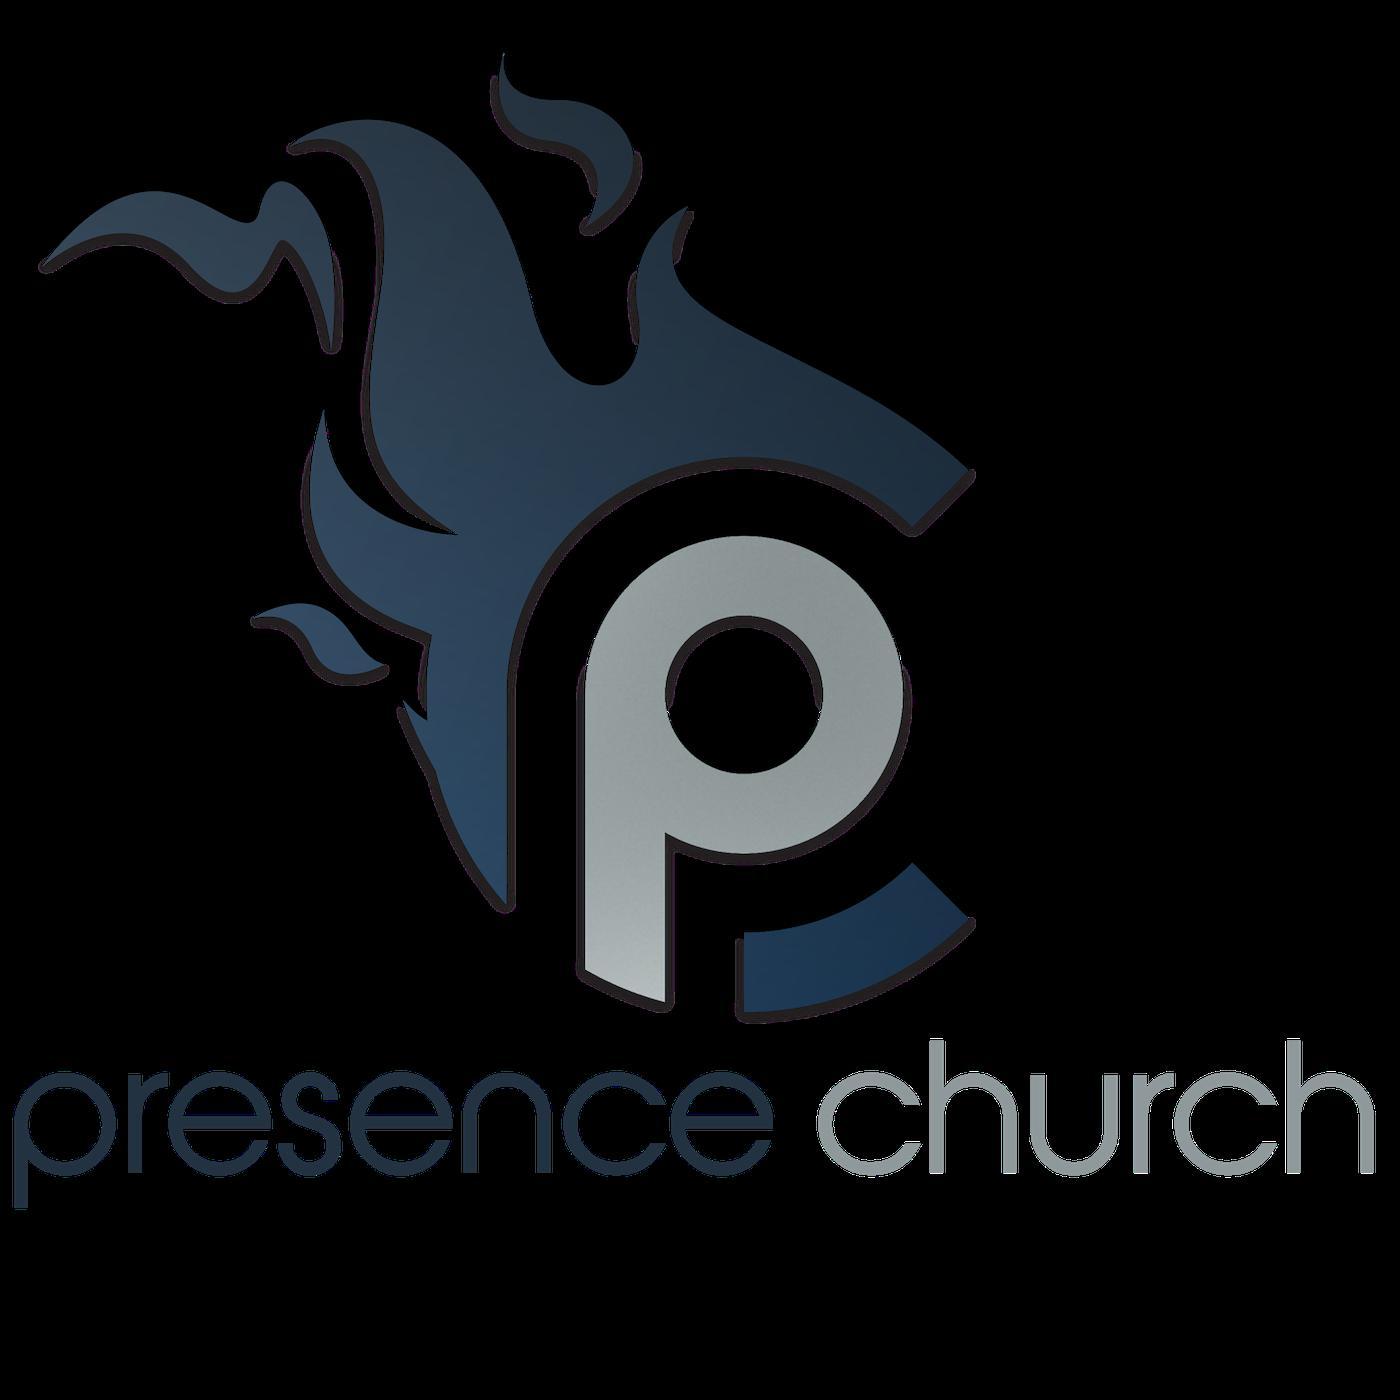 Presence Church in Perry GA (podcast) - Justin & Tina Gaston